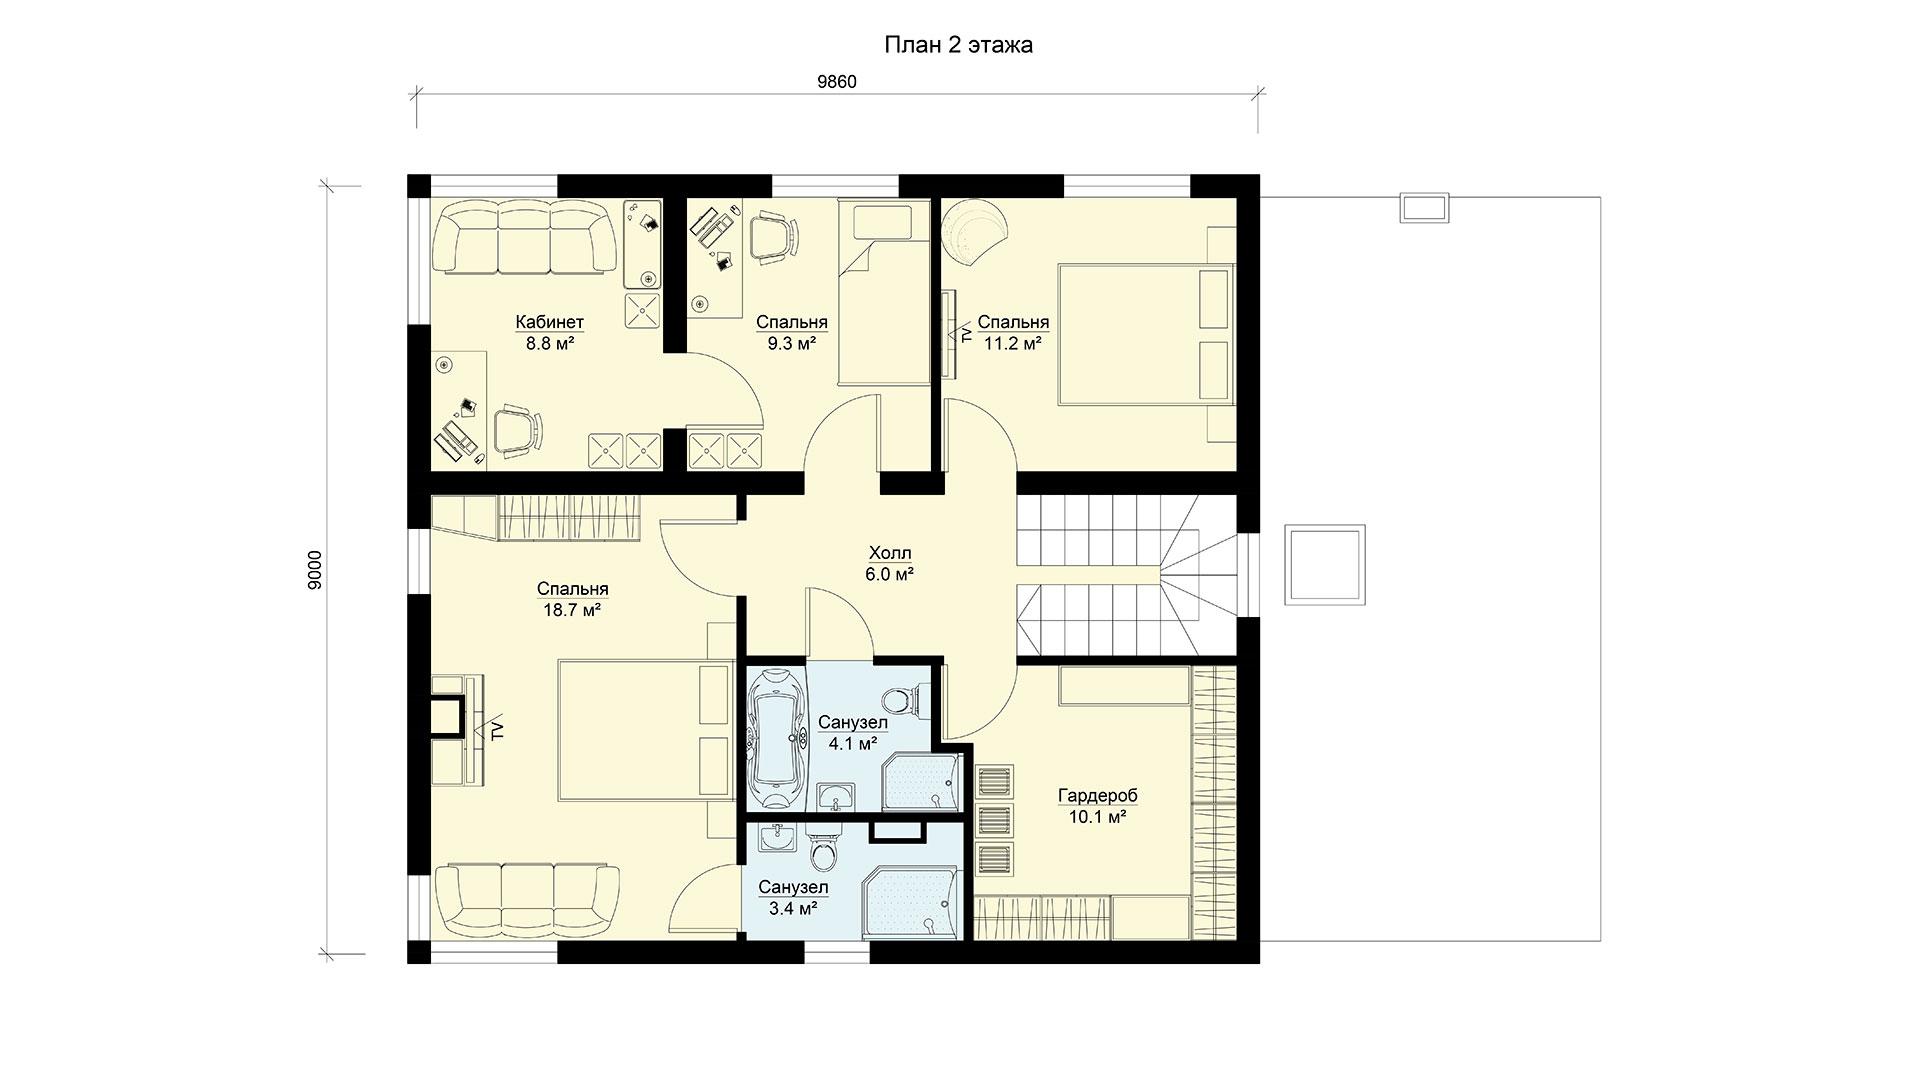 План второго этажа двухэтажного дома БЭНПАН, проект МС-189.